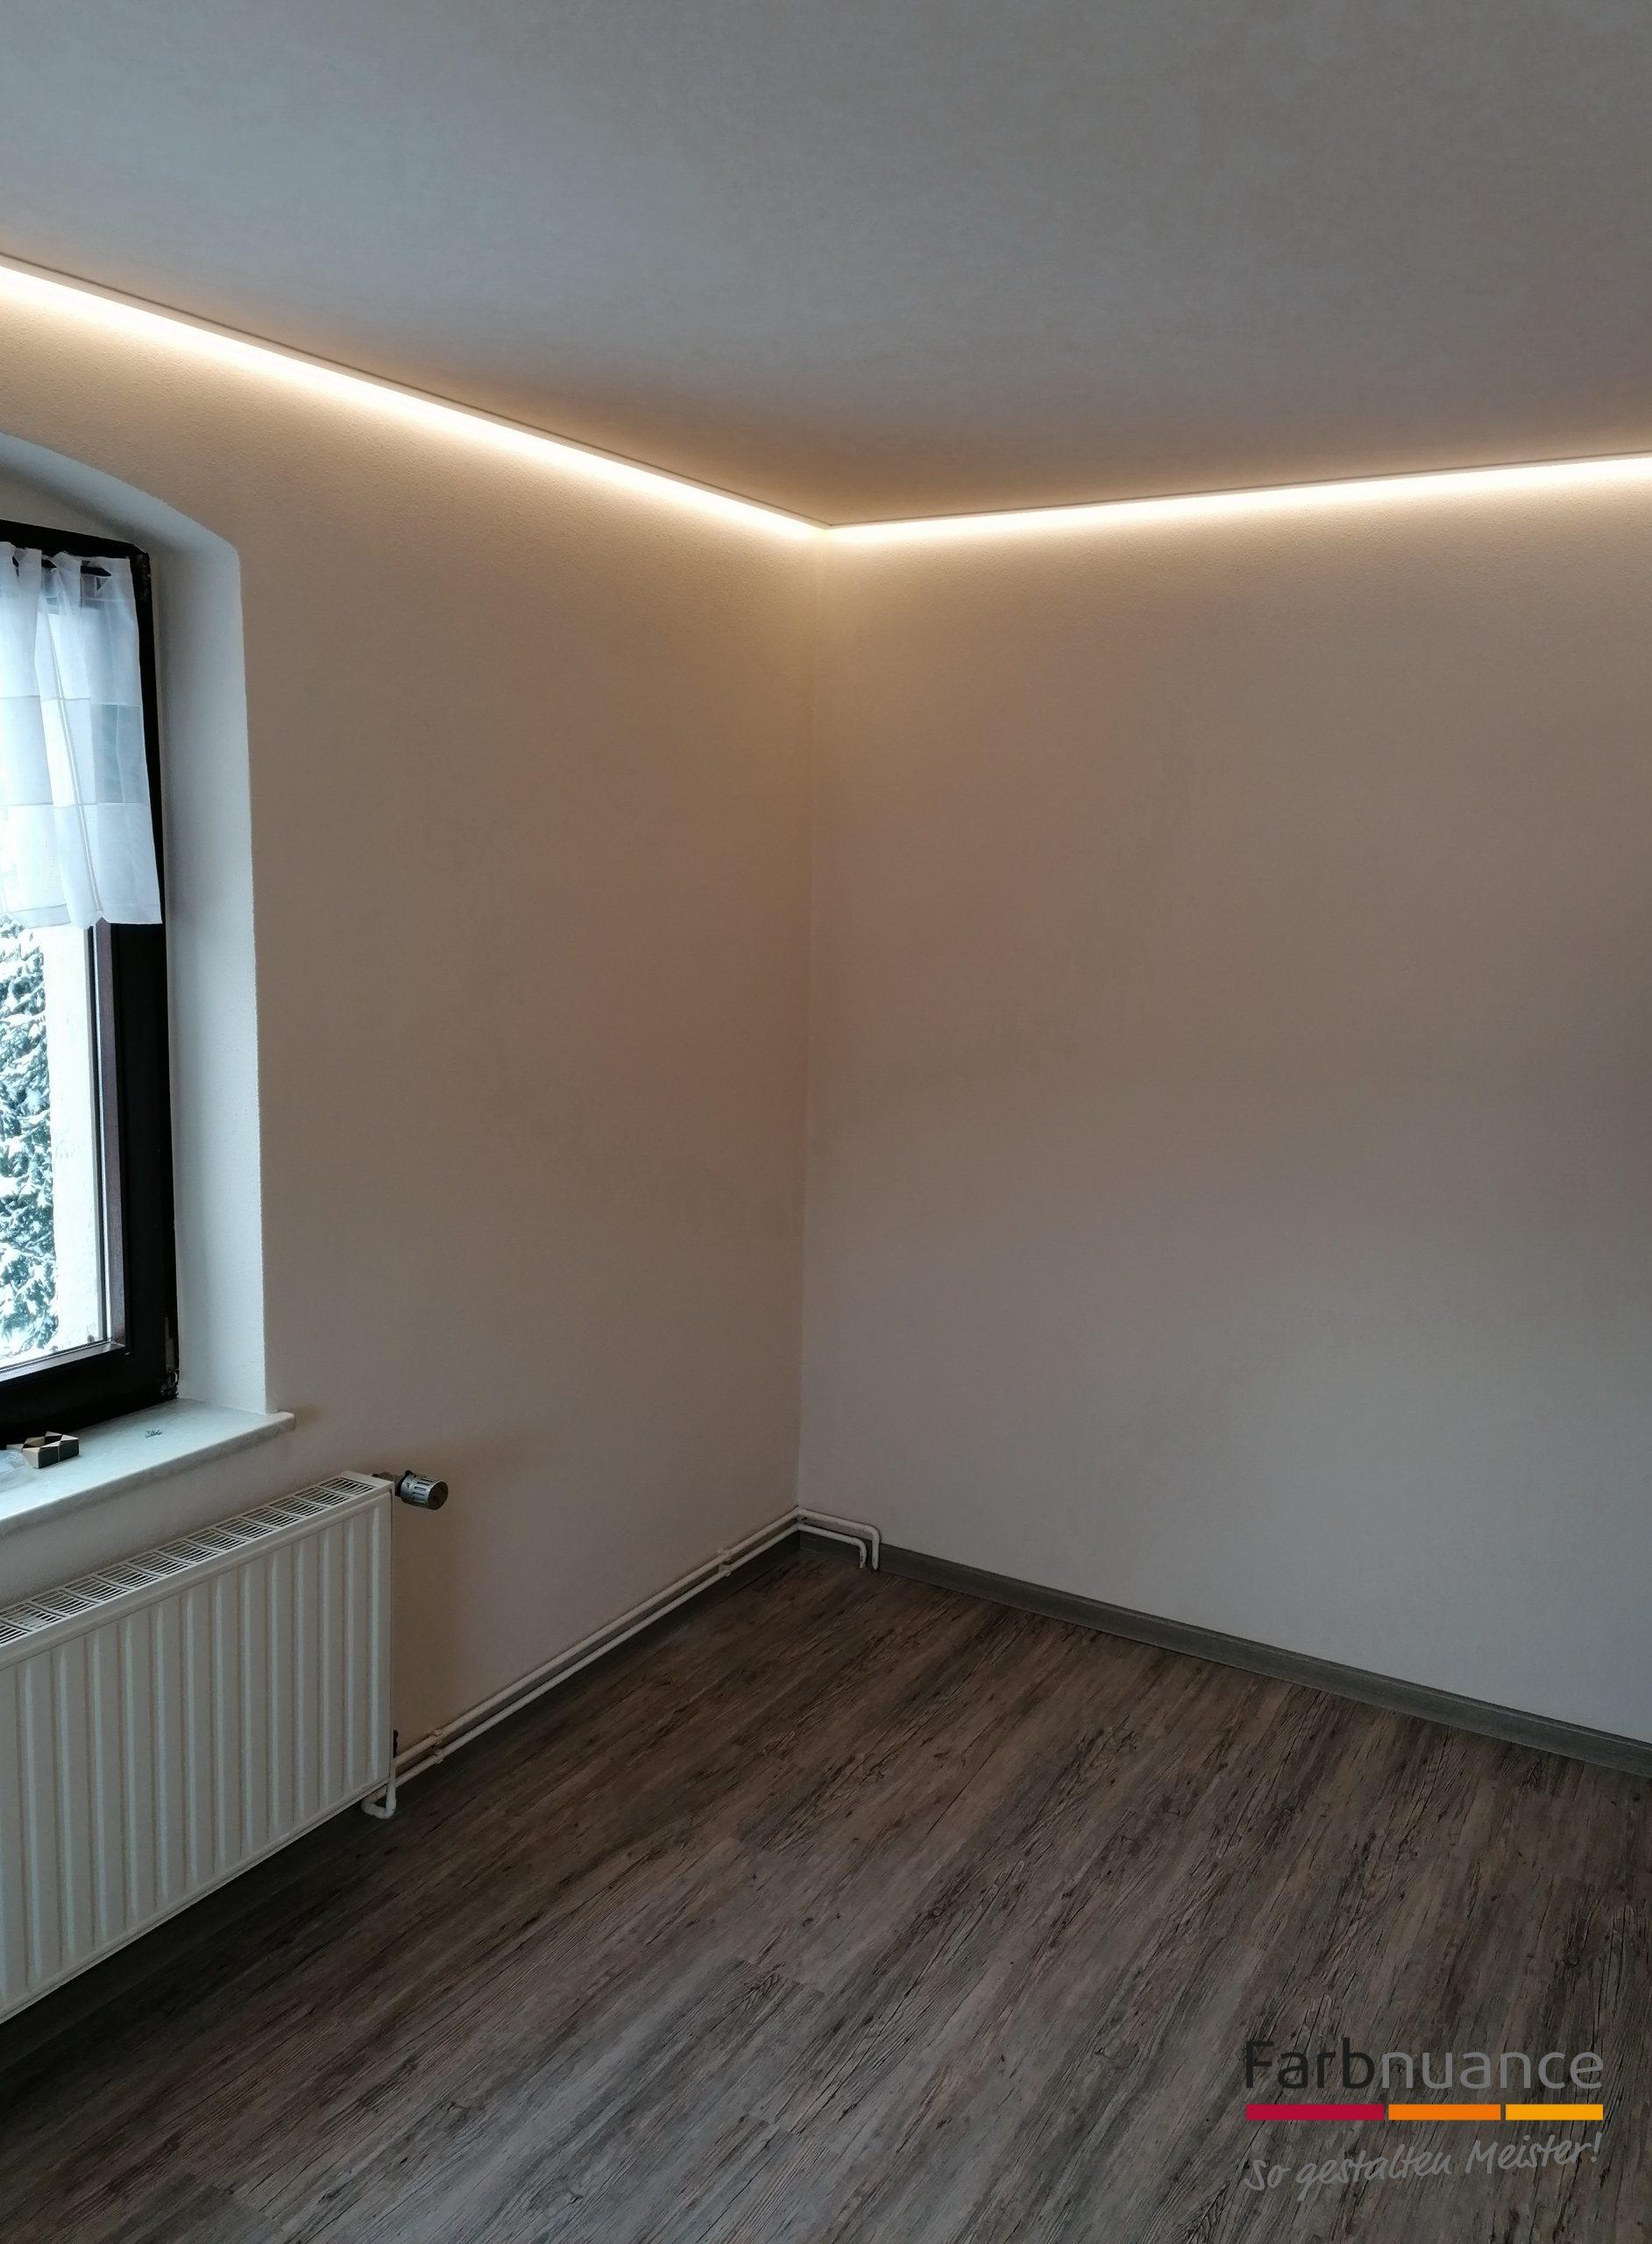 Farbnuance,Maler, Malerfirma,Fußboden,Vinyl,Pirna,Jessen,Vinylfußboden, (5)